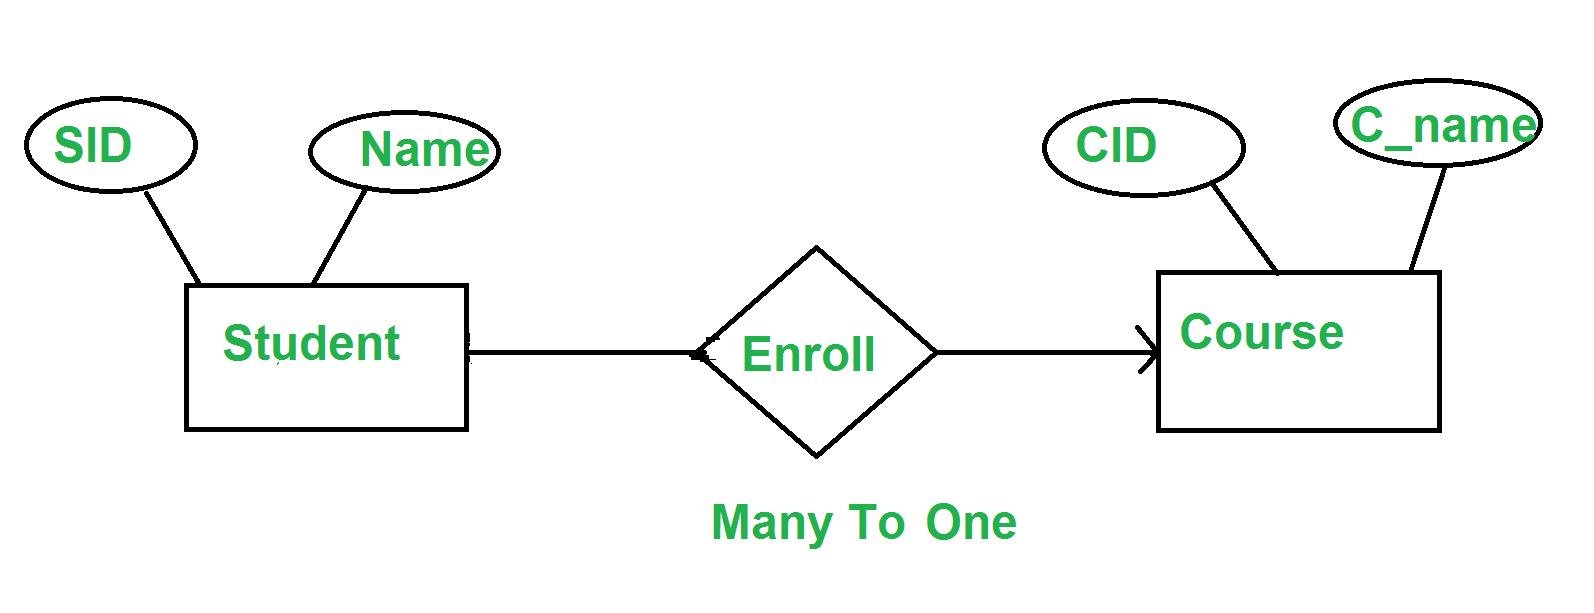 Minimization Of Er Diagrams - Geeksforgeeks with regard to Er Diagram In Rdbms